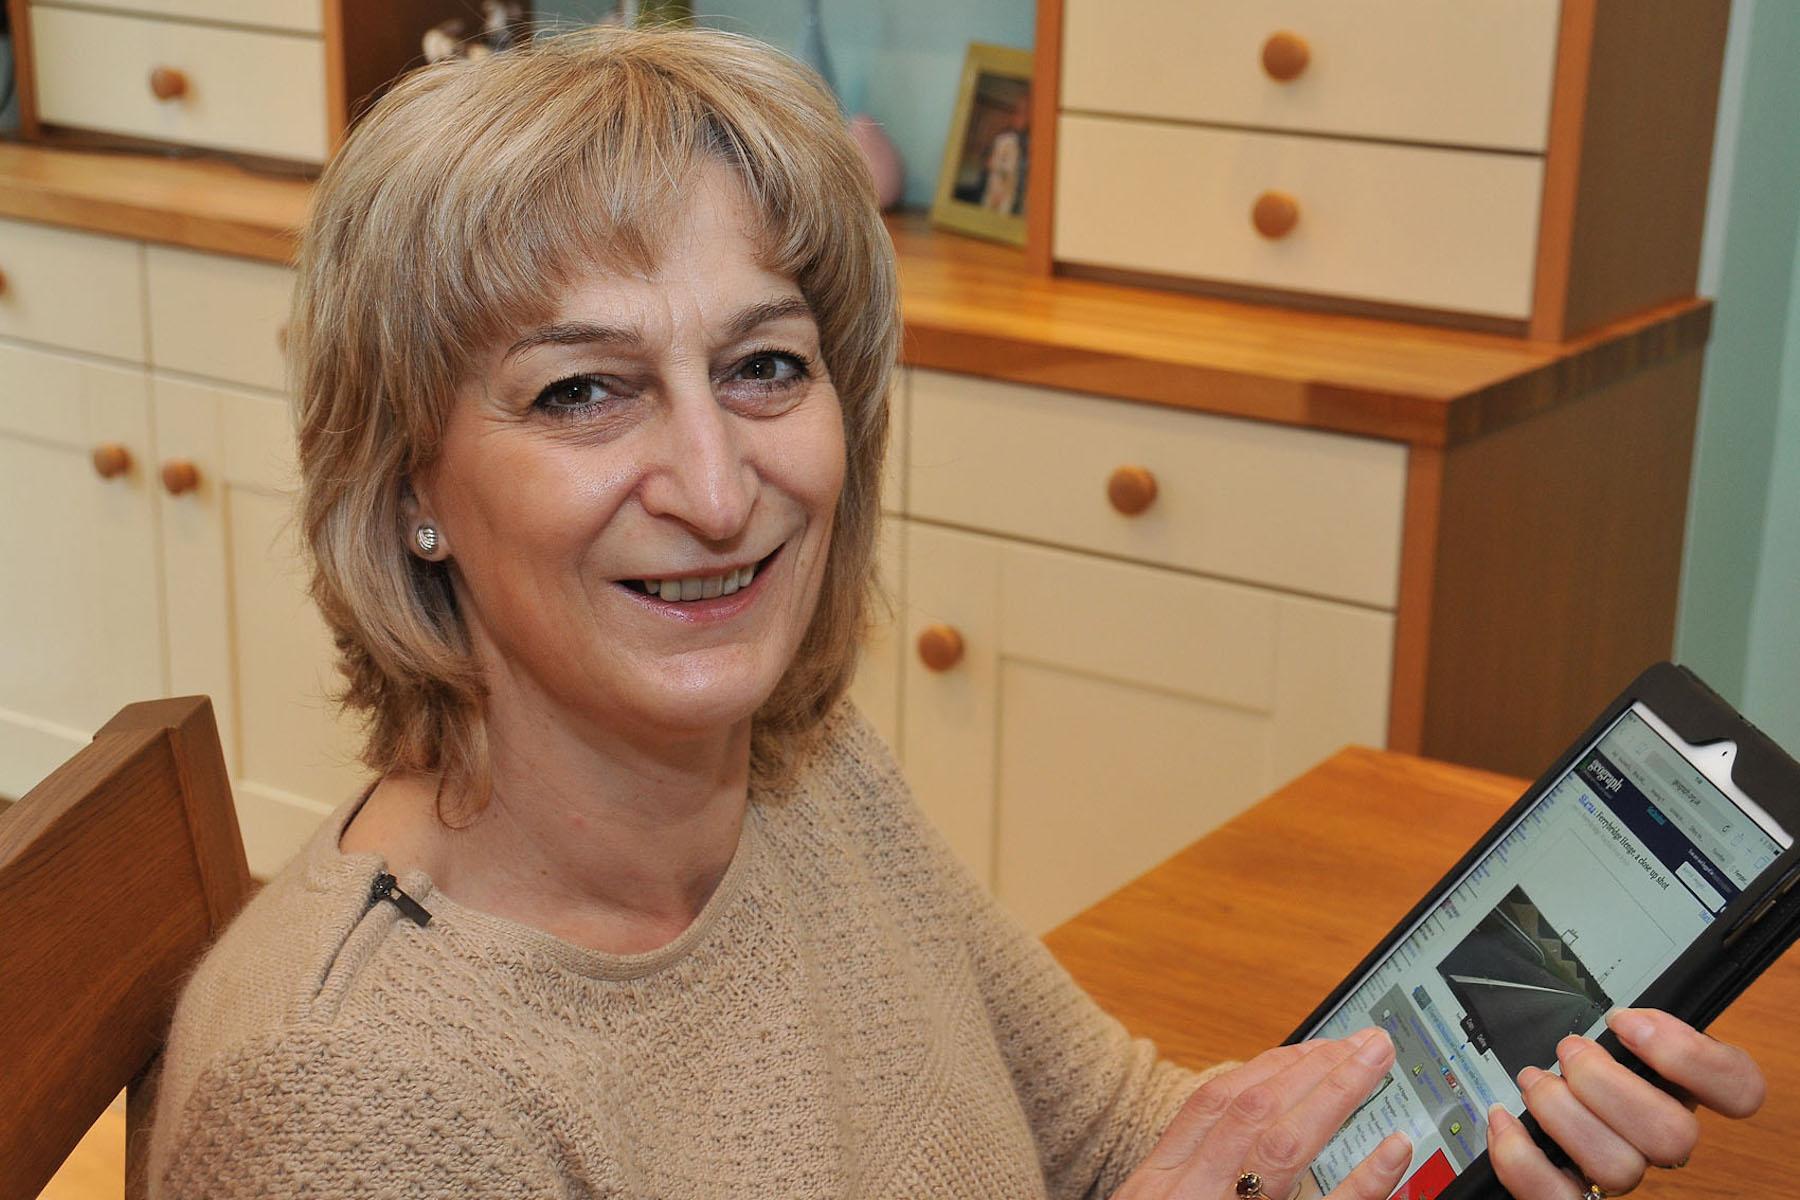 Elaine Wilcox Lens Replacement Surgery